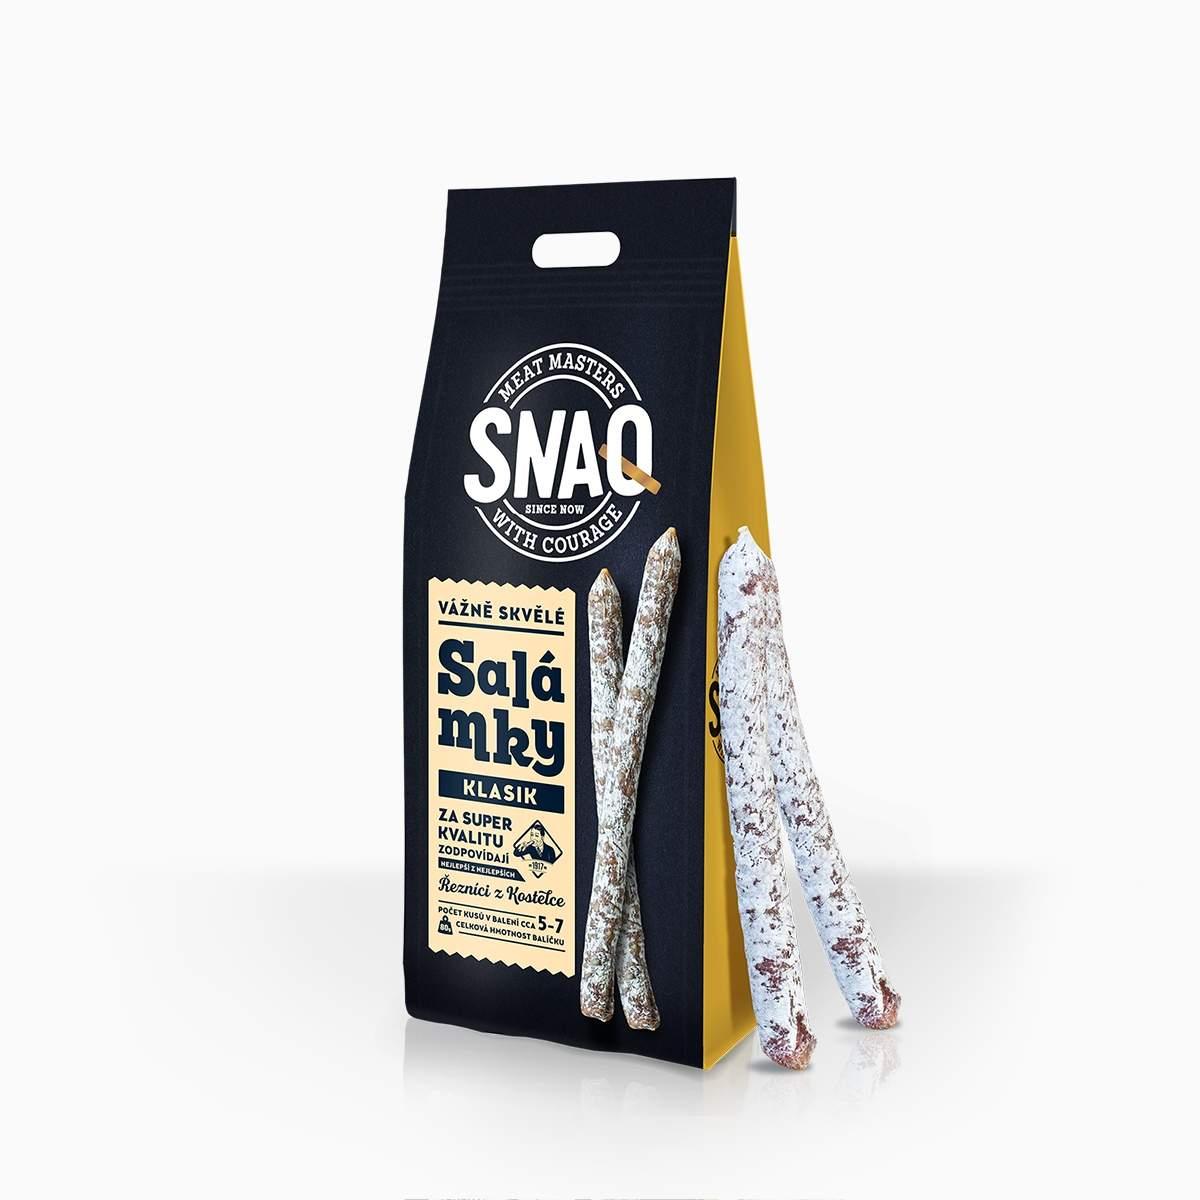 Kostelecké uzeniny Snaq mini klobásky 60g